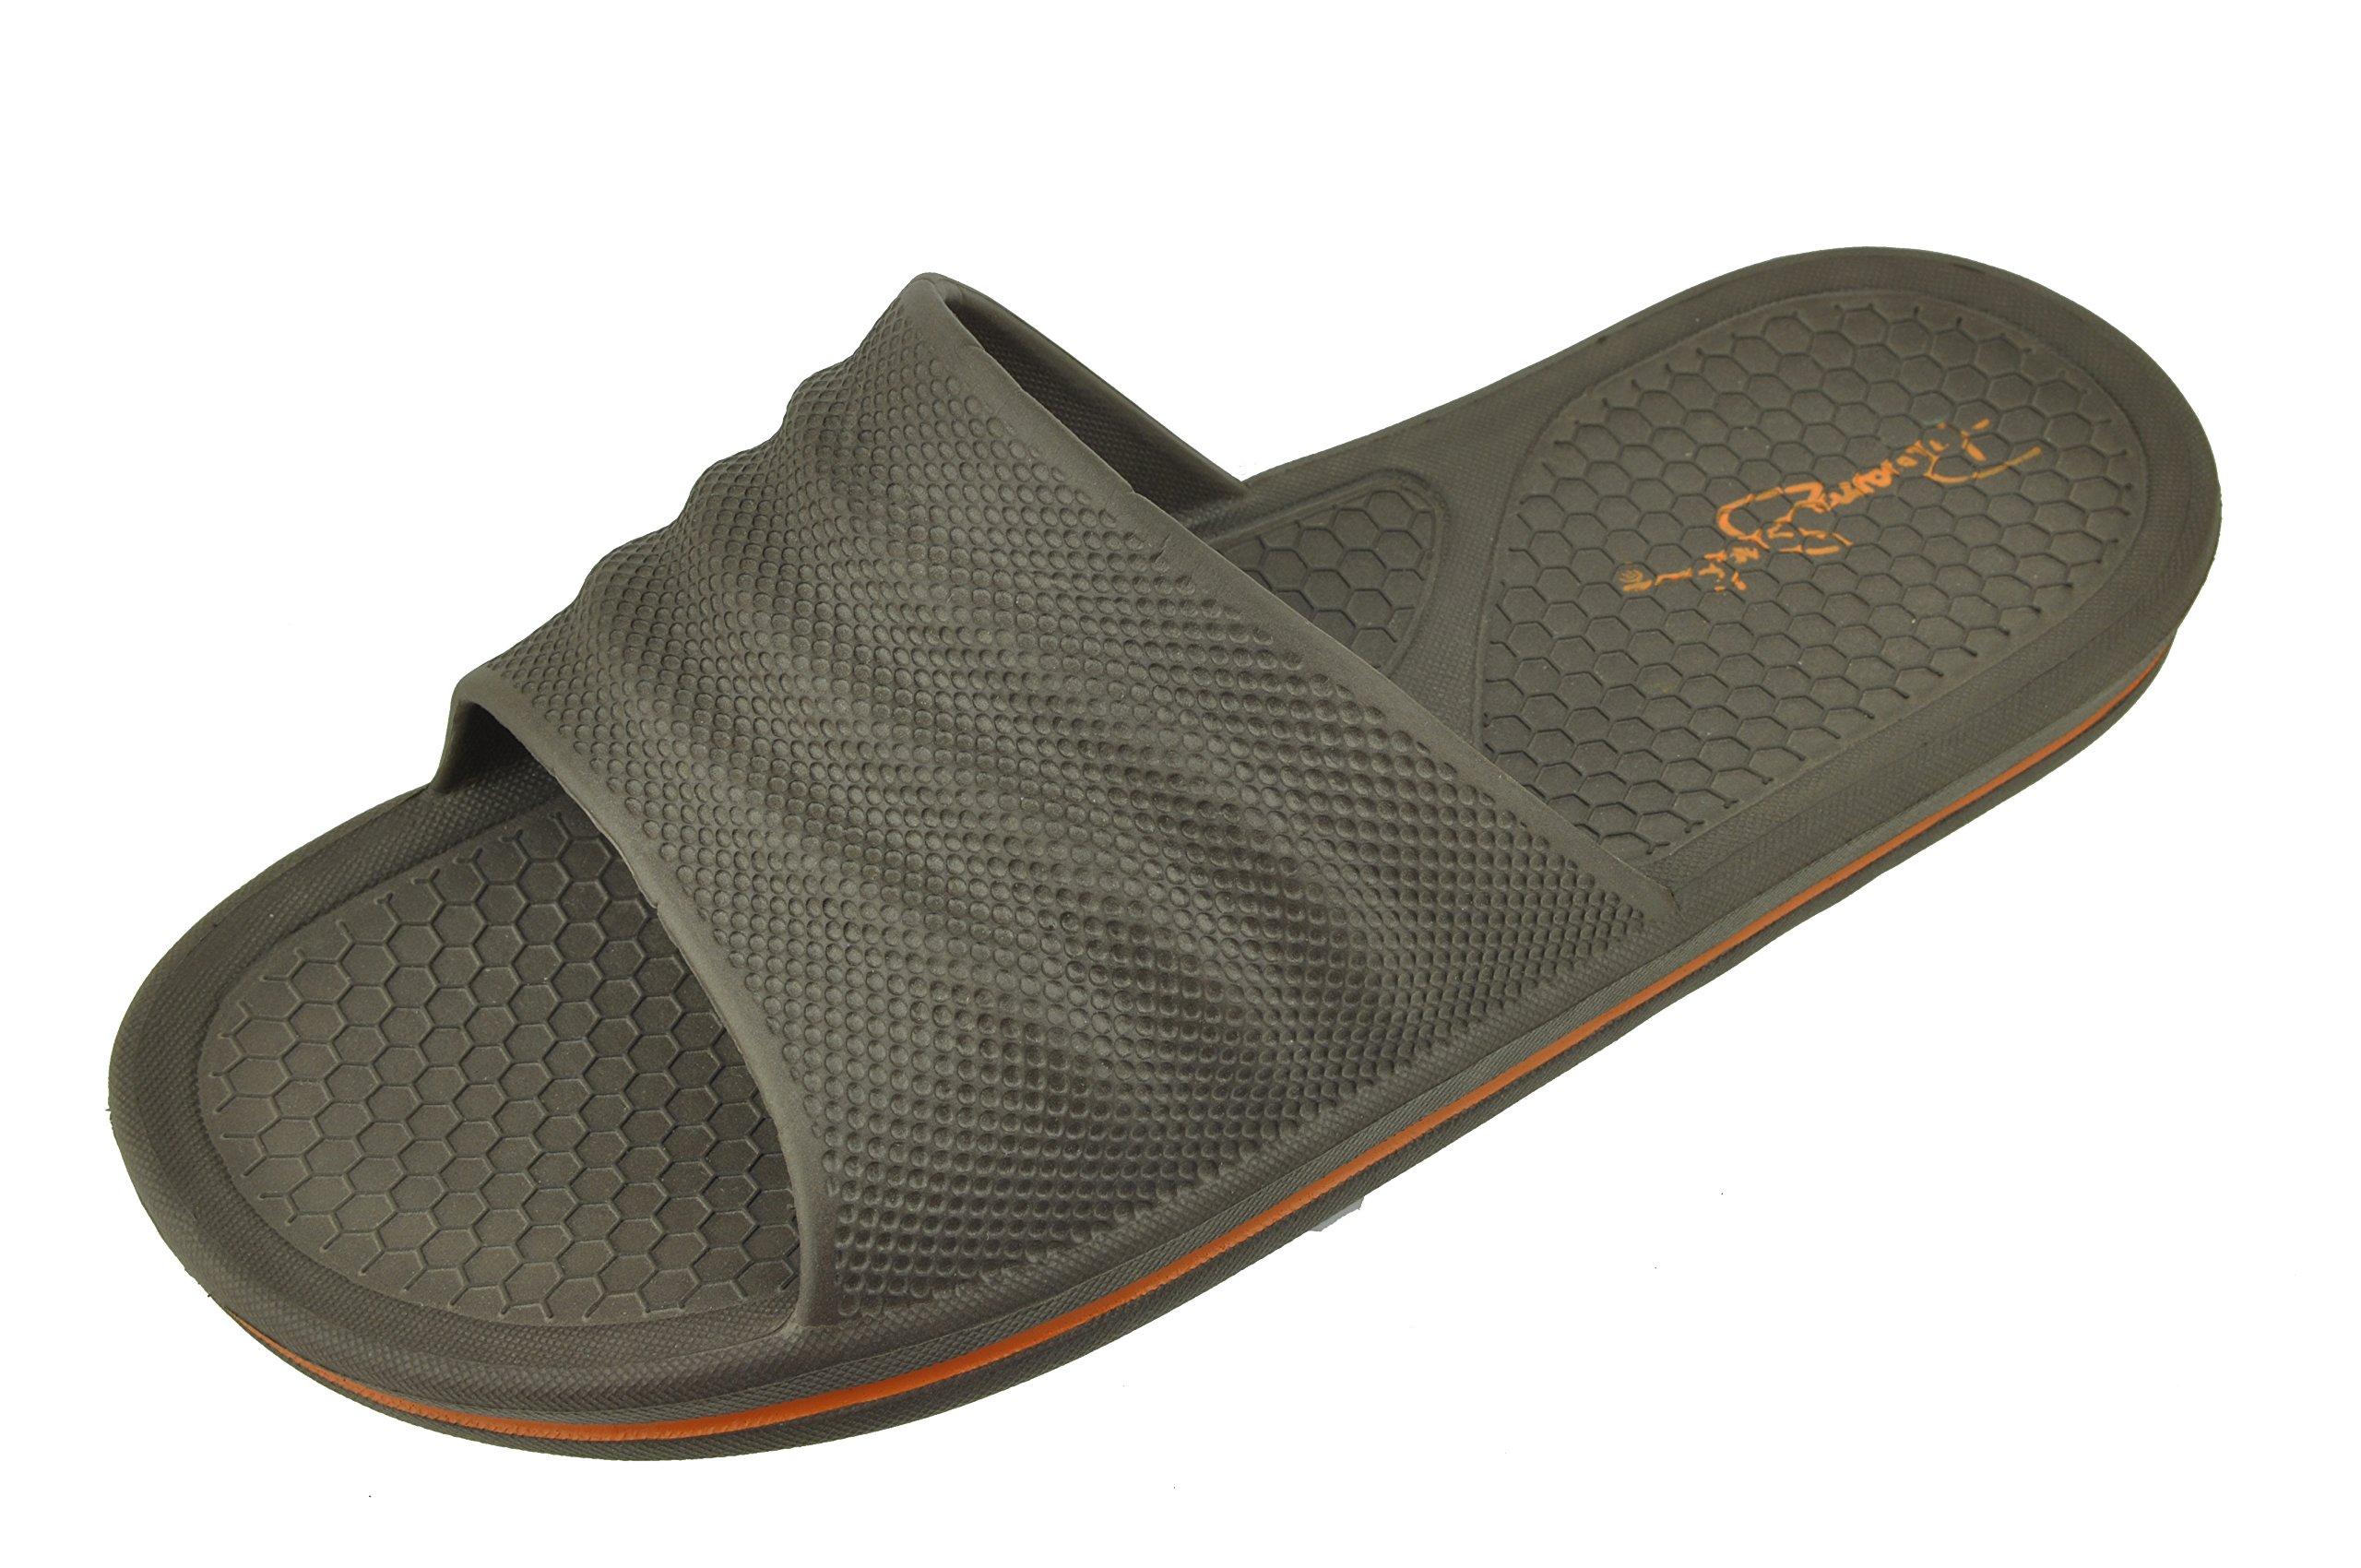 Panama Jack Men's Weekender Sport Casual Slide Sandal, Brown, Large/Size 9-10